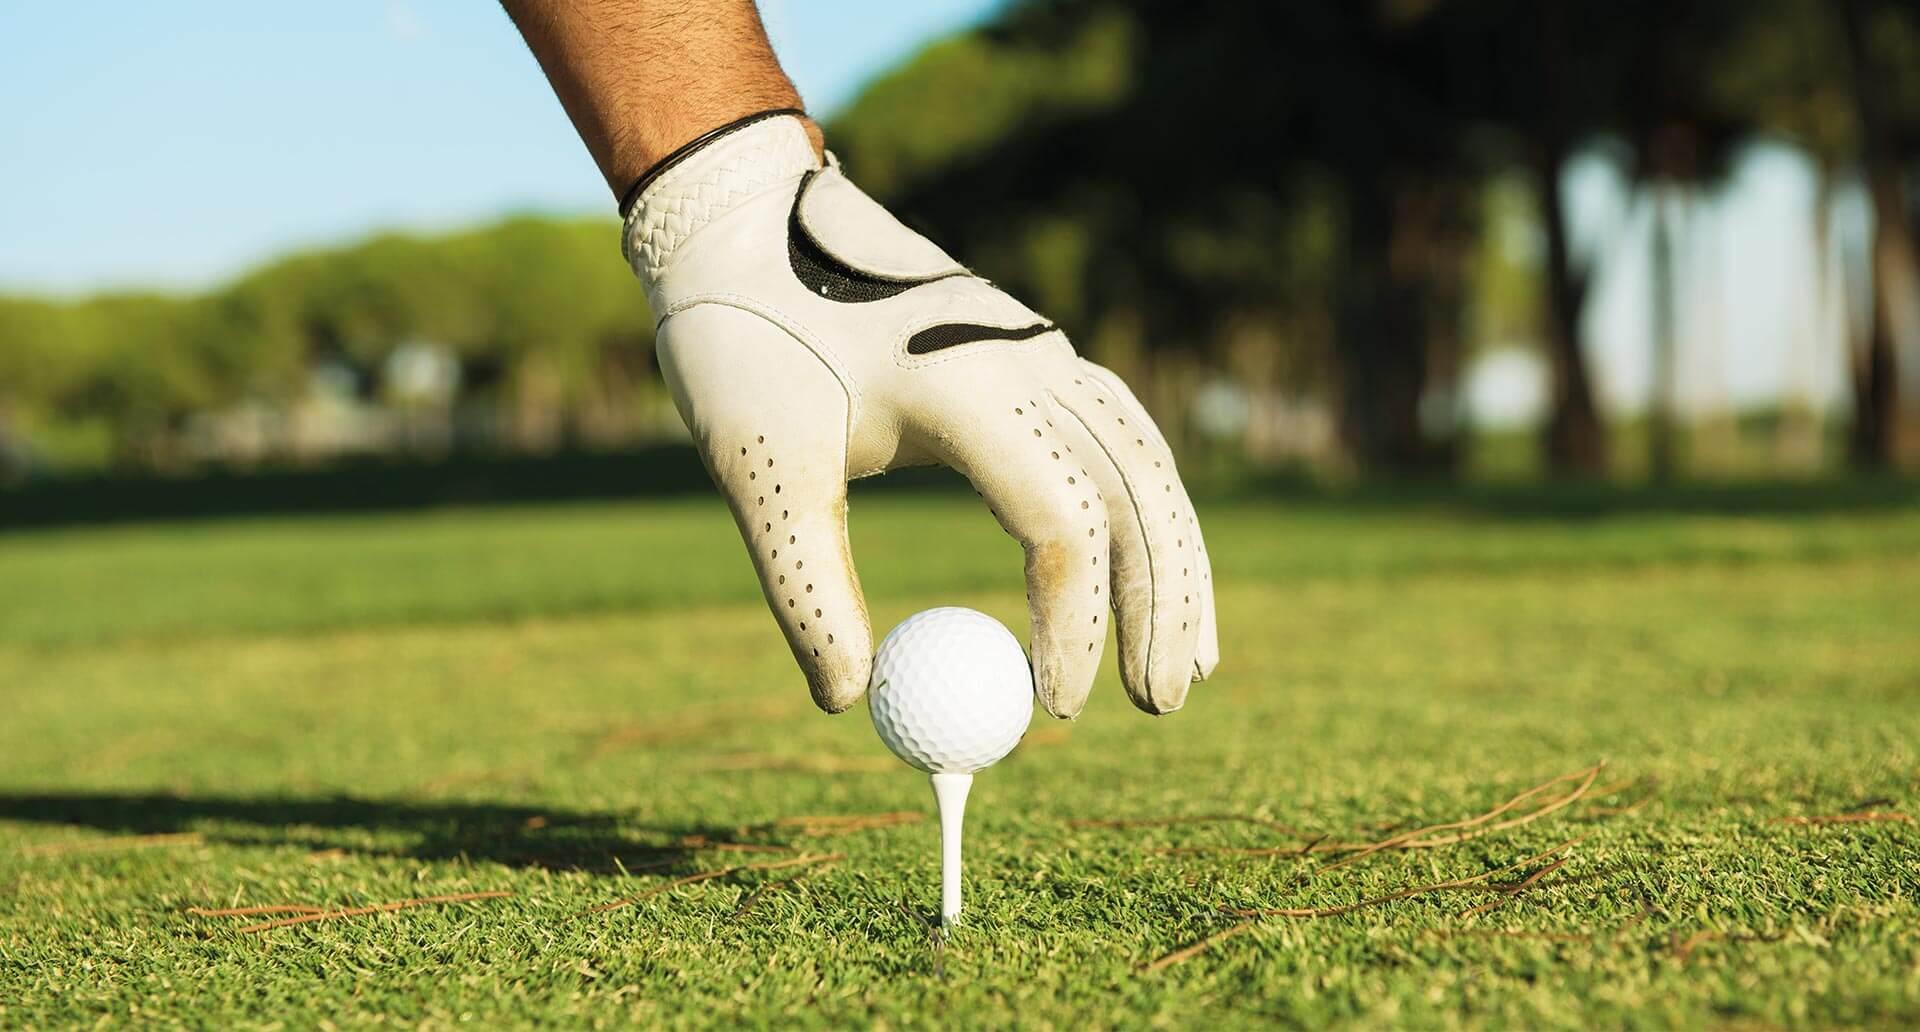 https://golfclub-peckeloh.de/wp-content/uploads/2018/11/greenfee_header-2.jpg